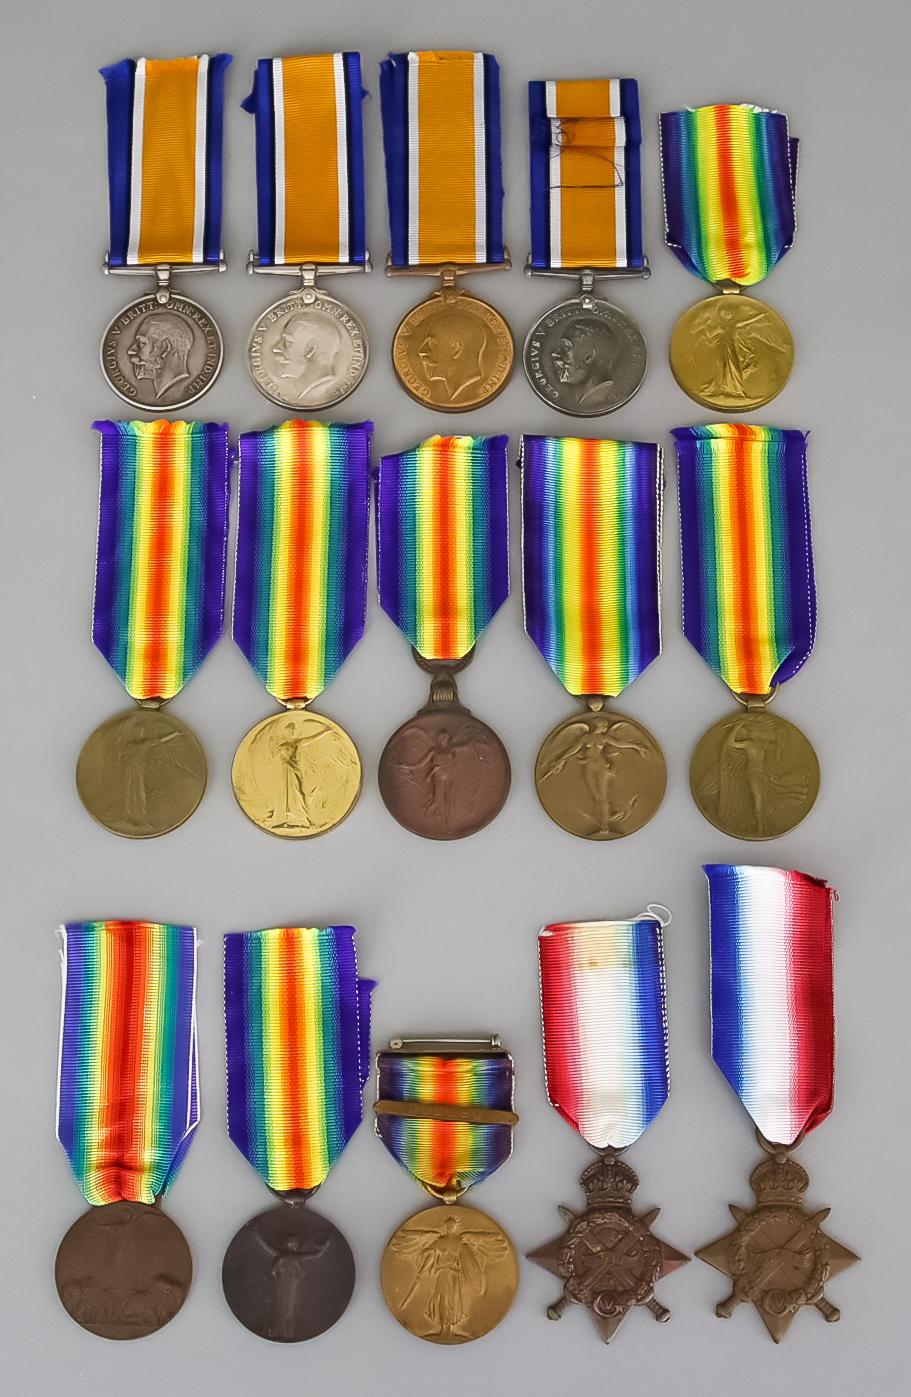 Four George V First World War War Medals, including - to 82272SJT.R.Wright.R.E., nine George V